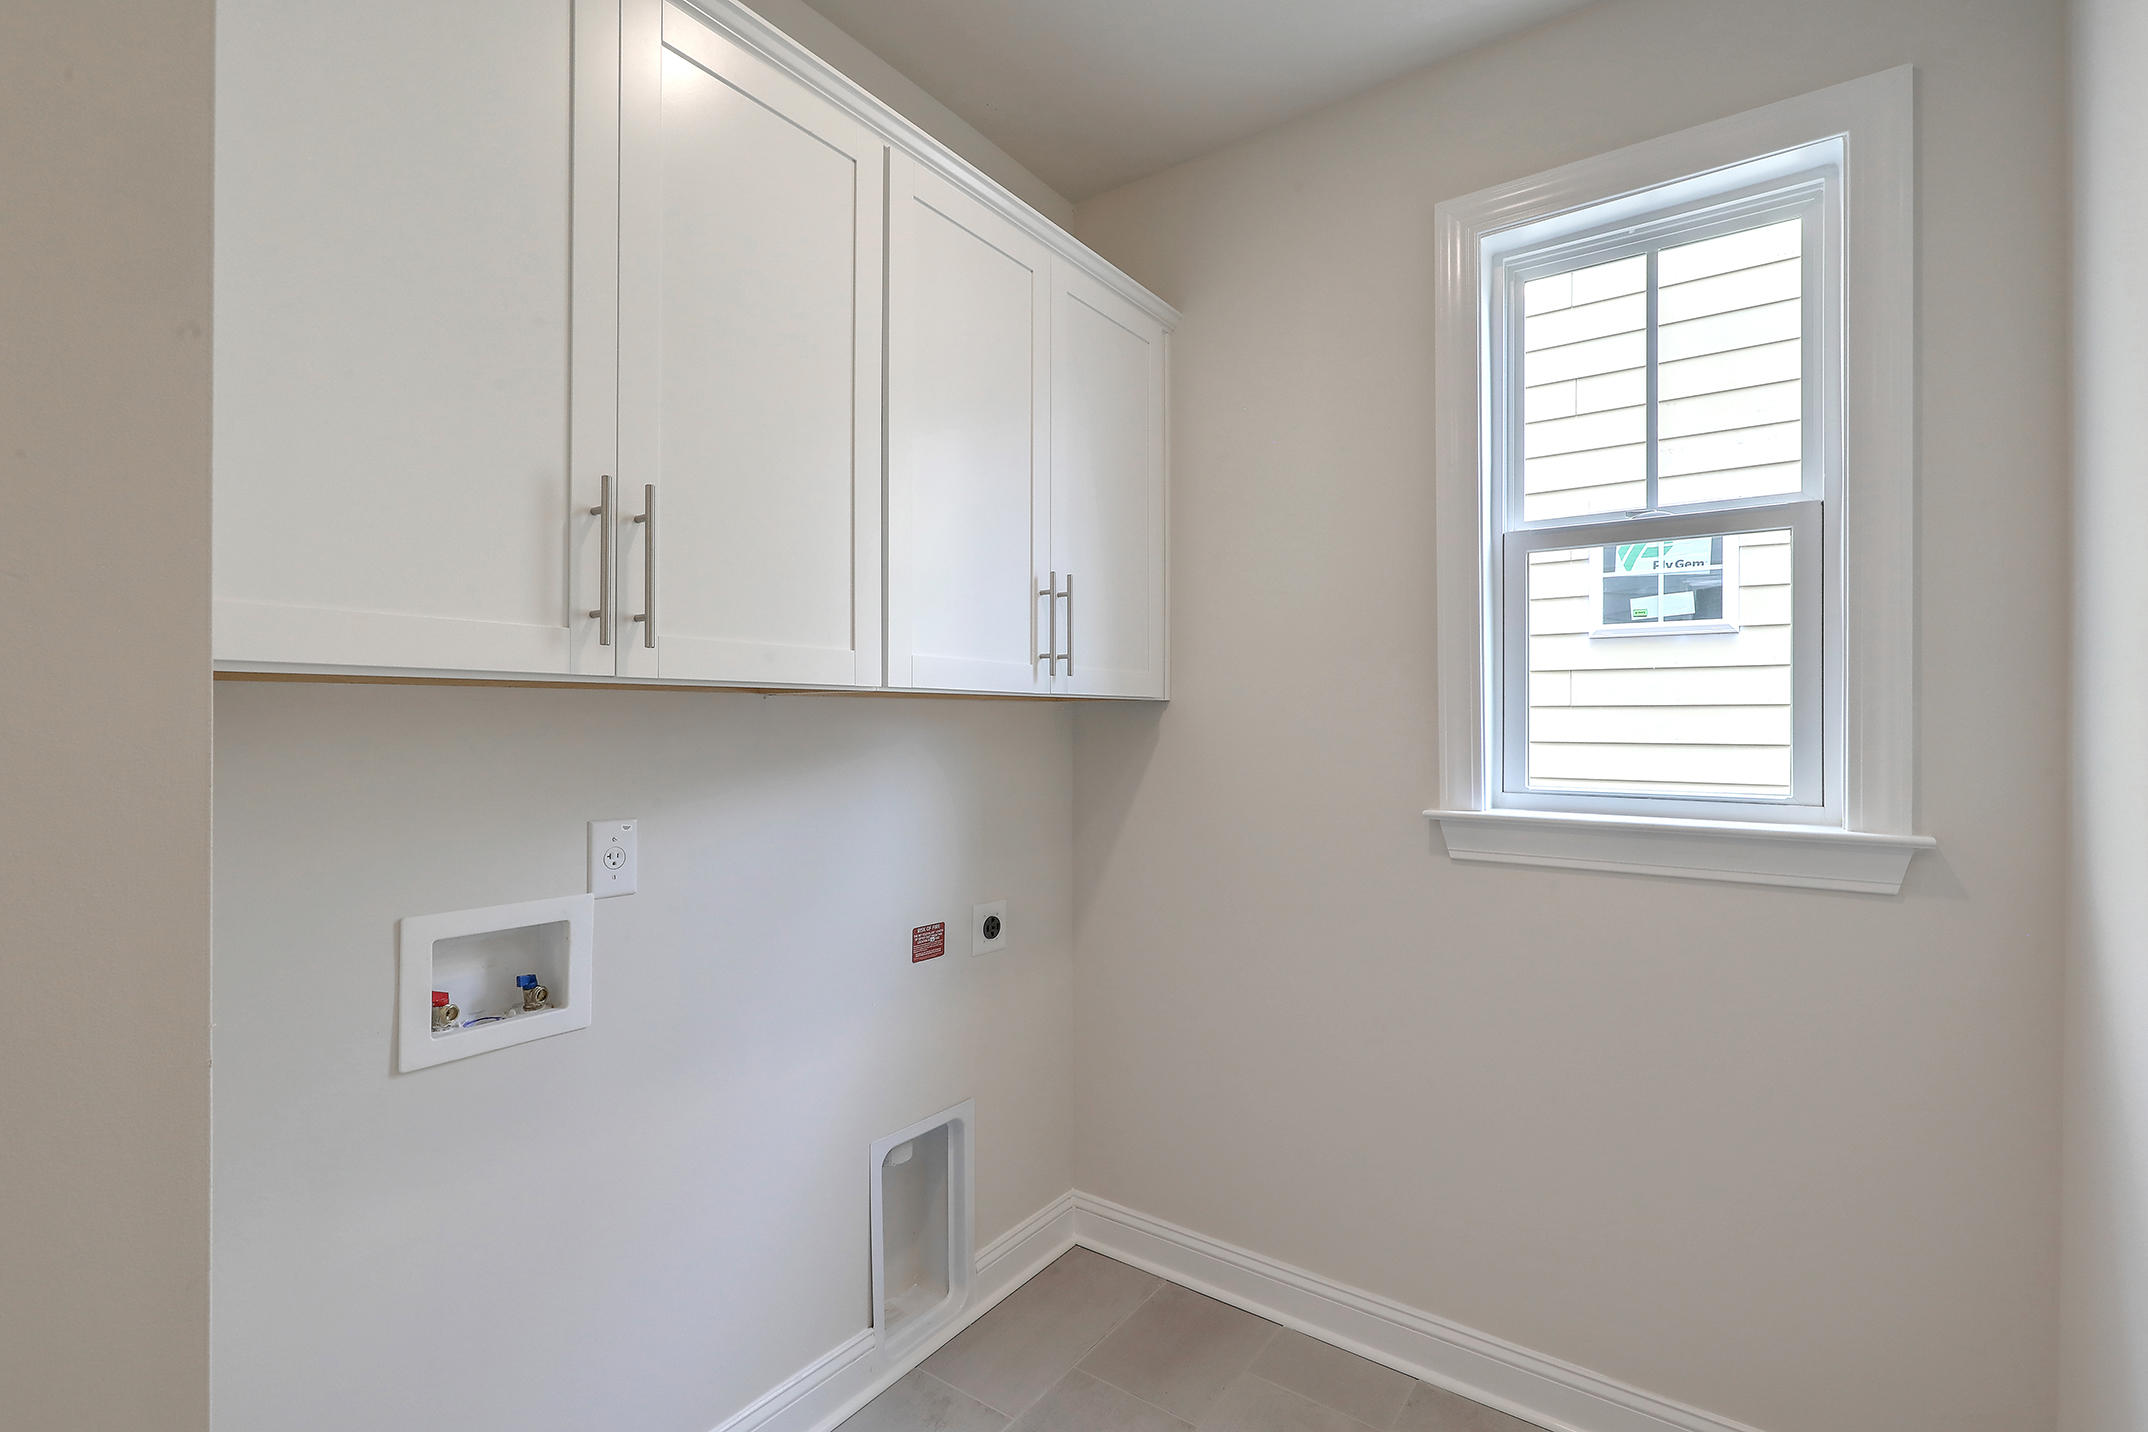 Bentley Park Homes For Sale - 1277 Gannett, Mount Pleasant, SC - 6